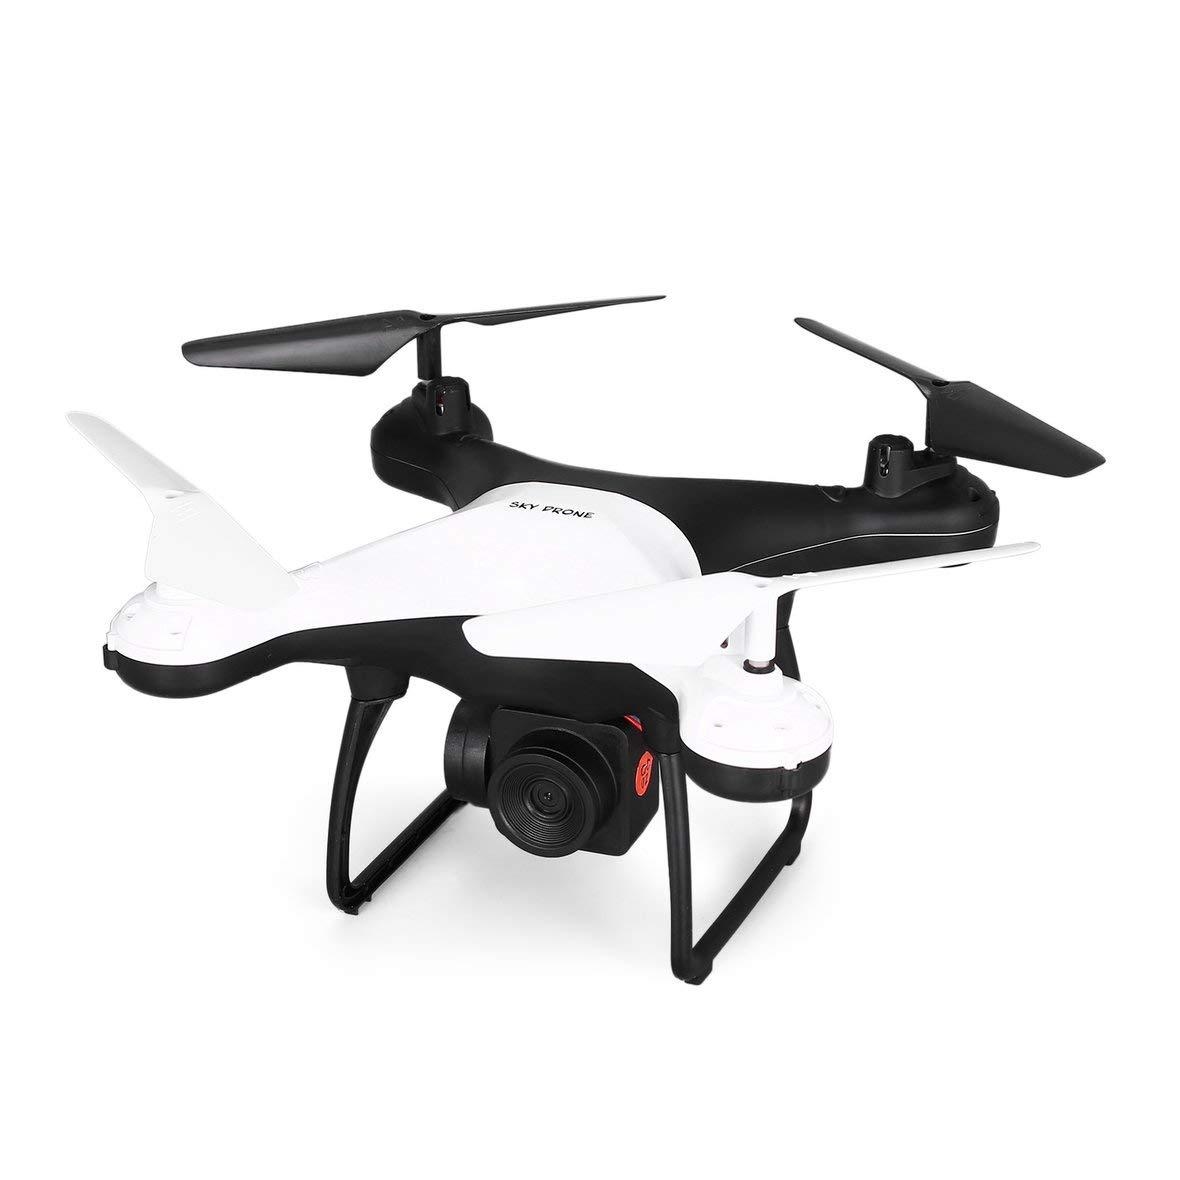 ToGames X35SH 2.4G Selfie RC Drone Quadcopter Flugzeuge mit 720P HD WiFi FPV Kamera 20 Minuten Lange Flughöhe Hold Headless 3D Flip